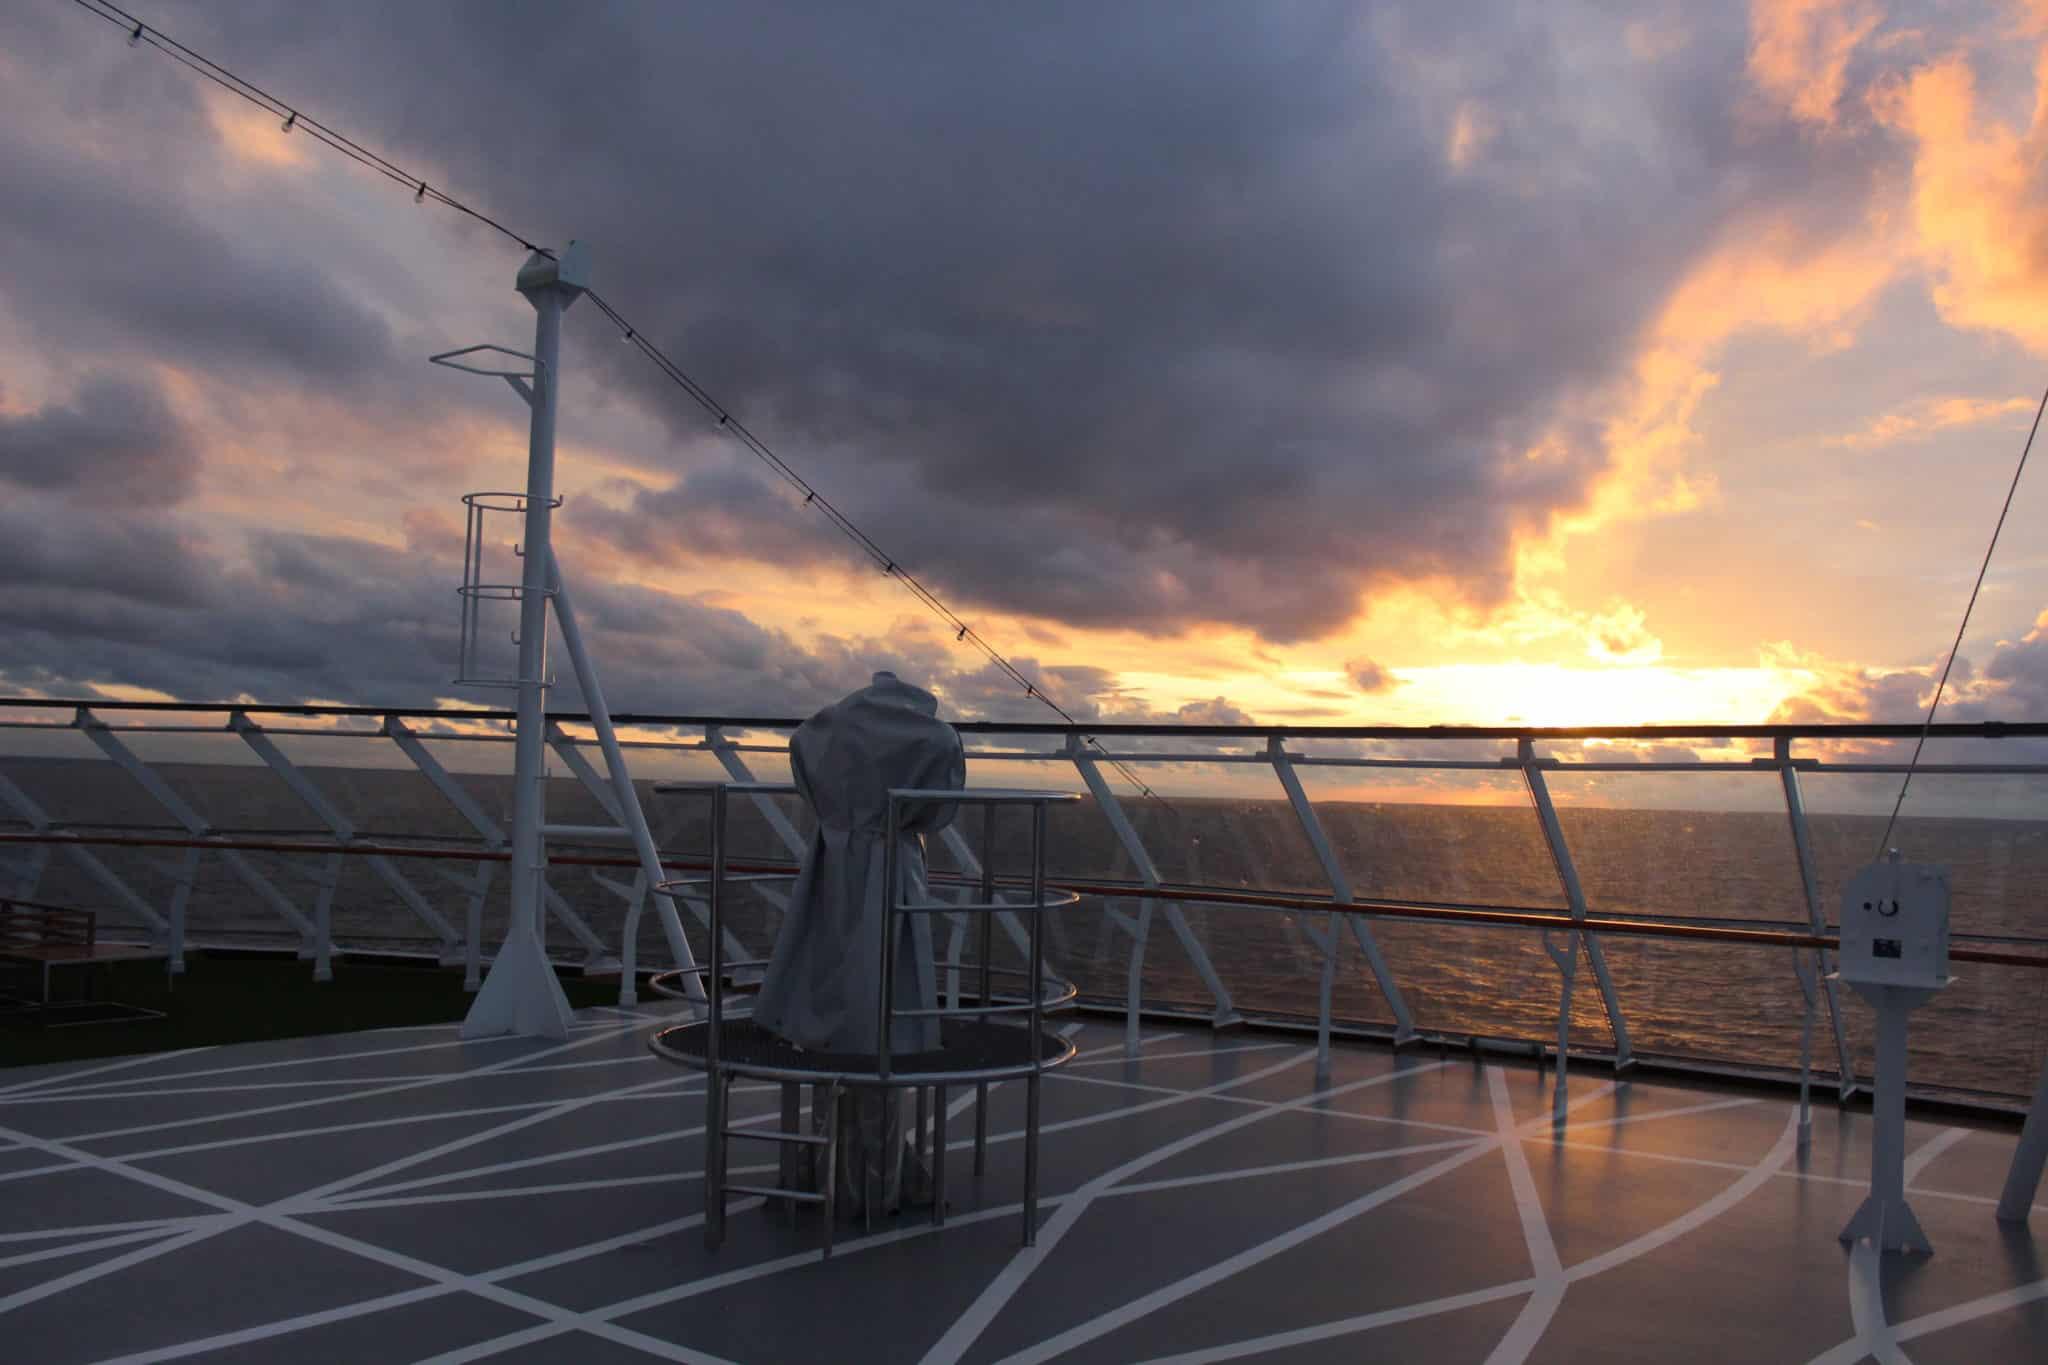 viking sky sunset